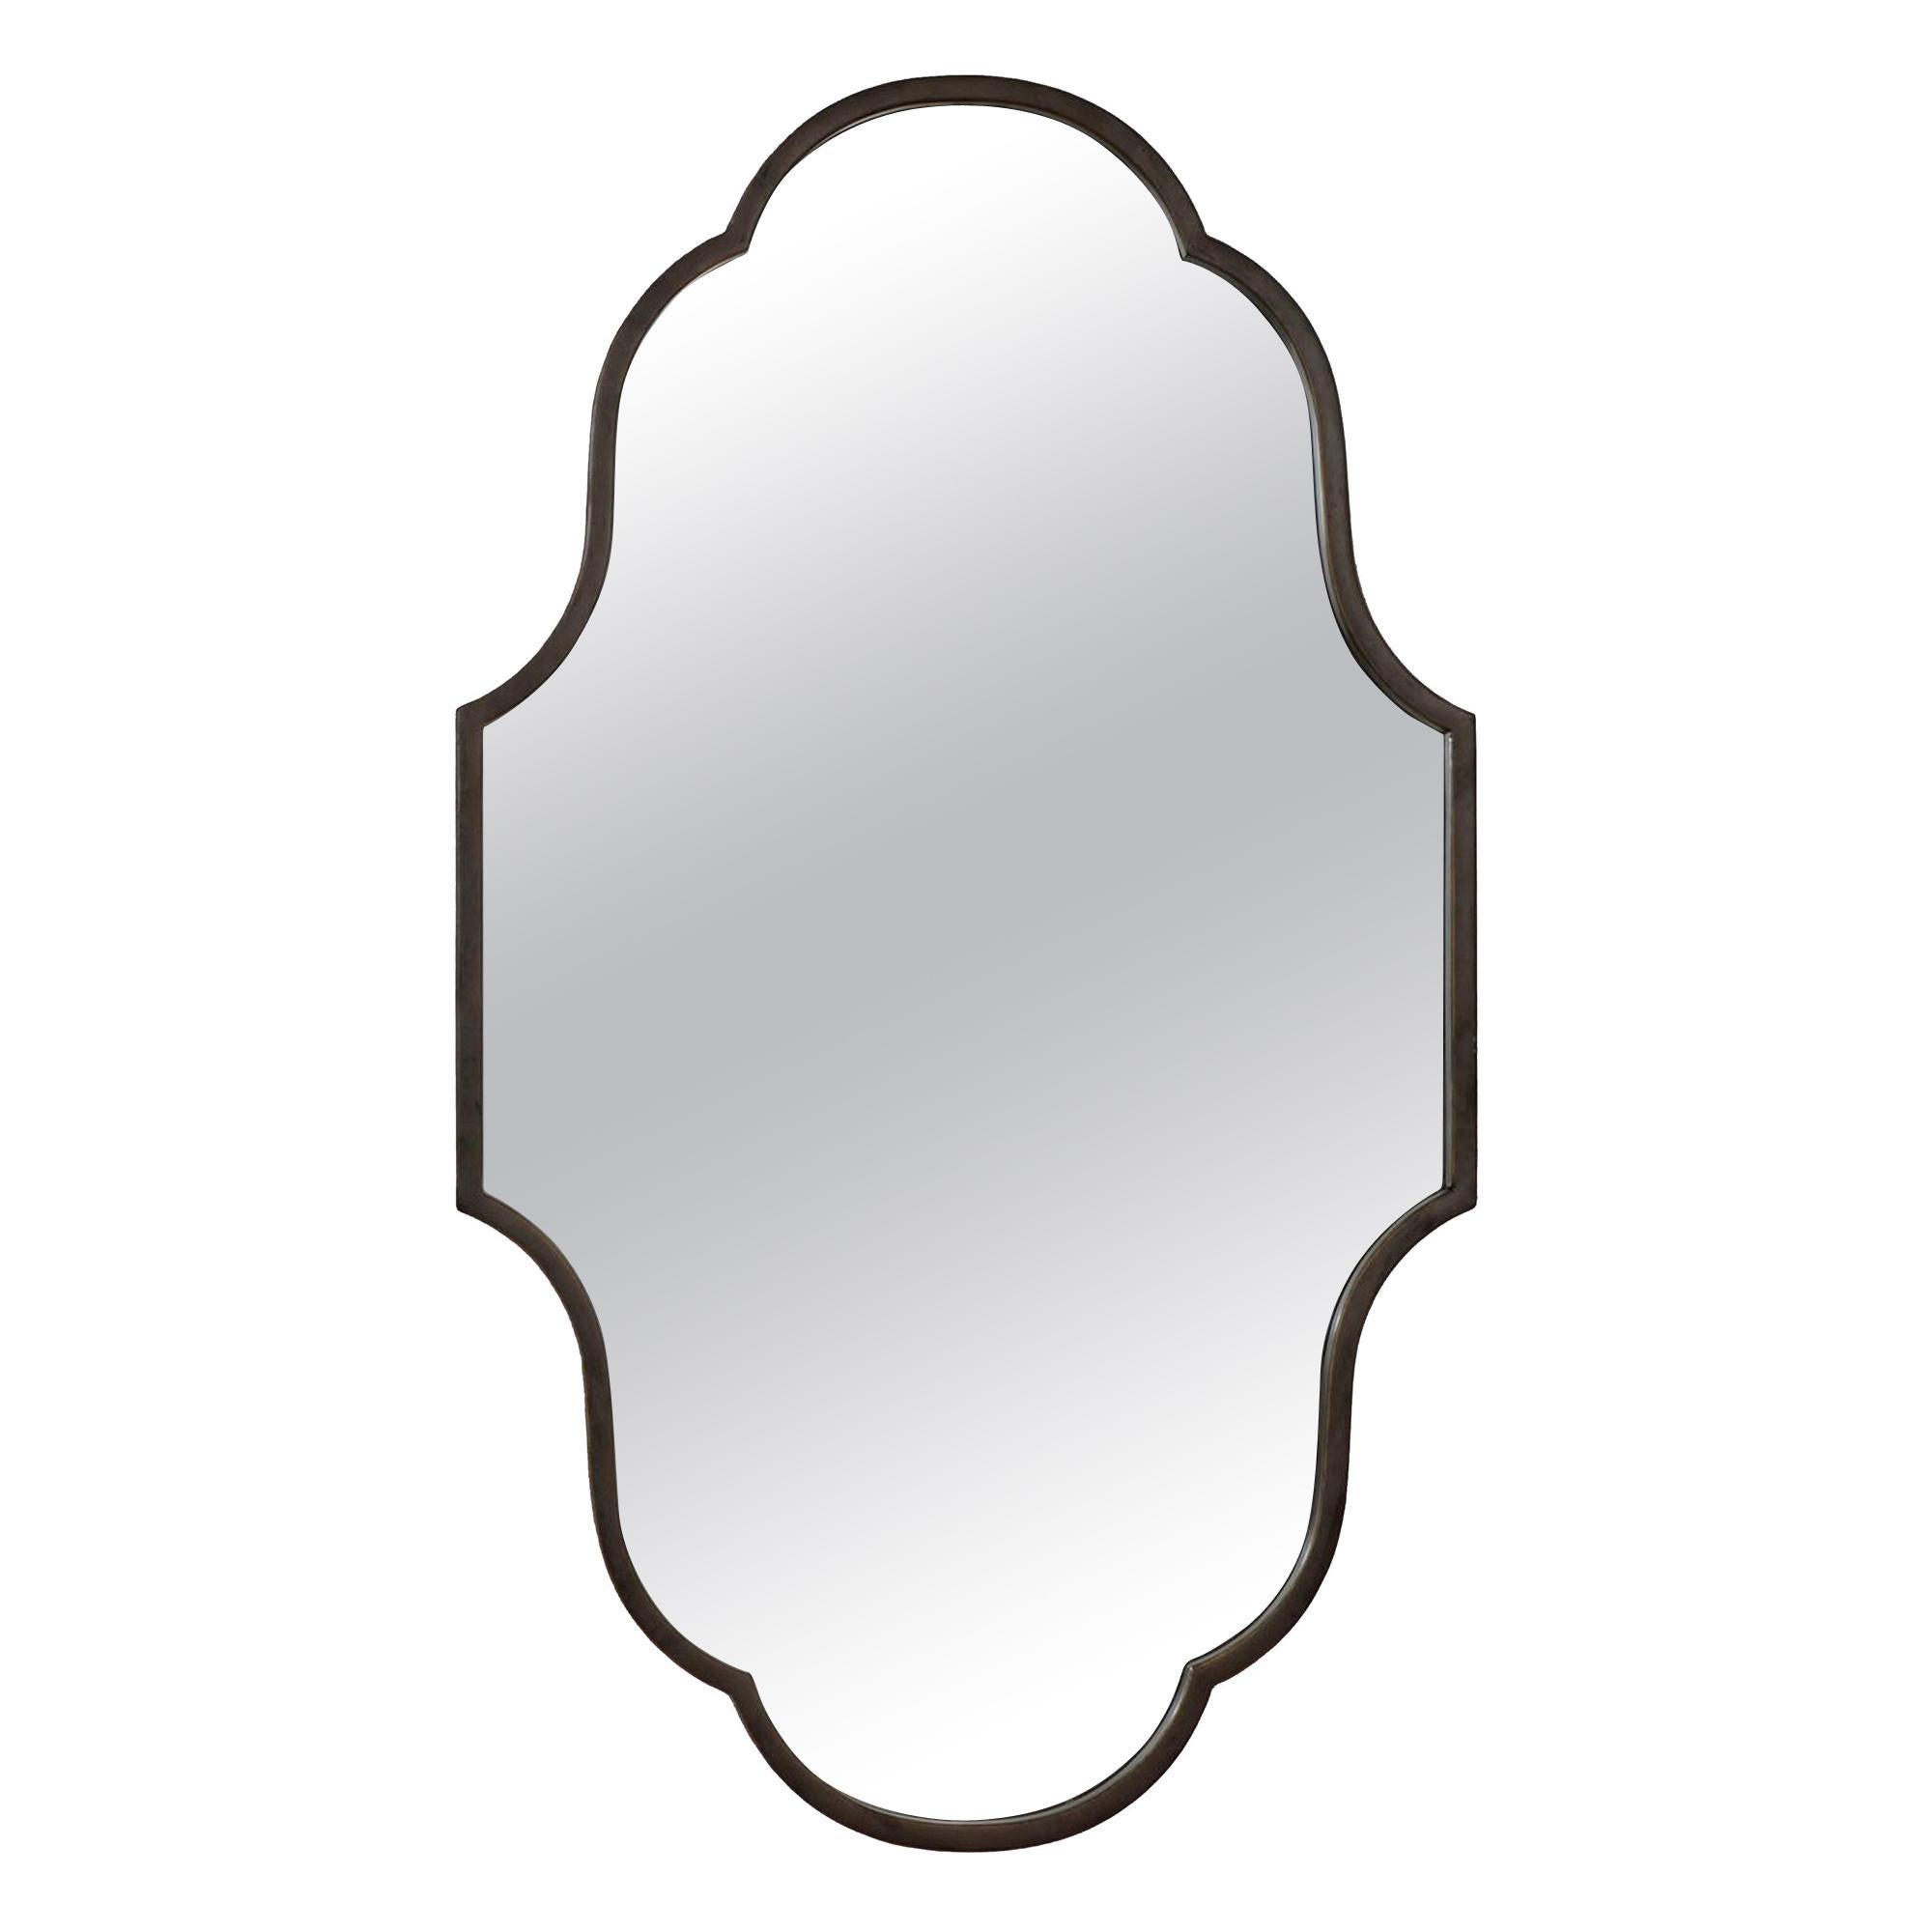 Gris Mirror in Metallic Gray by CuratedKravet